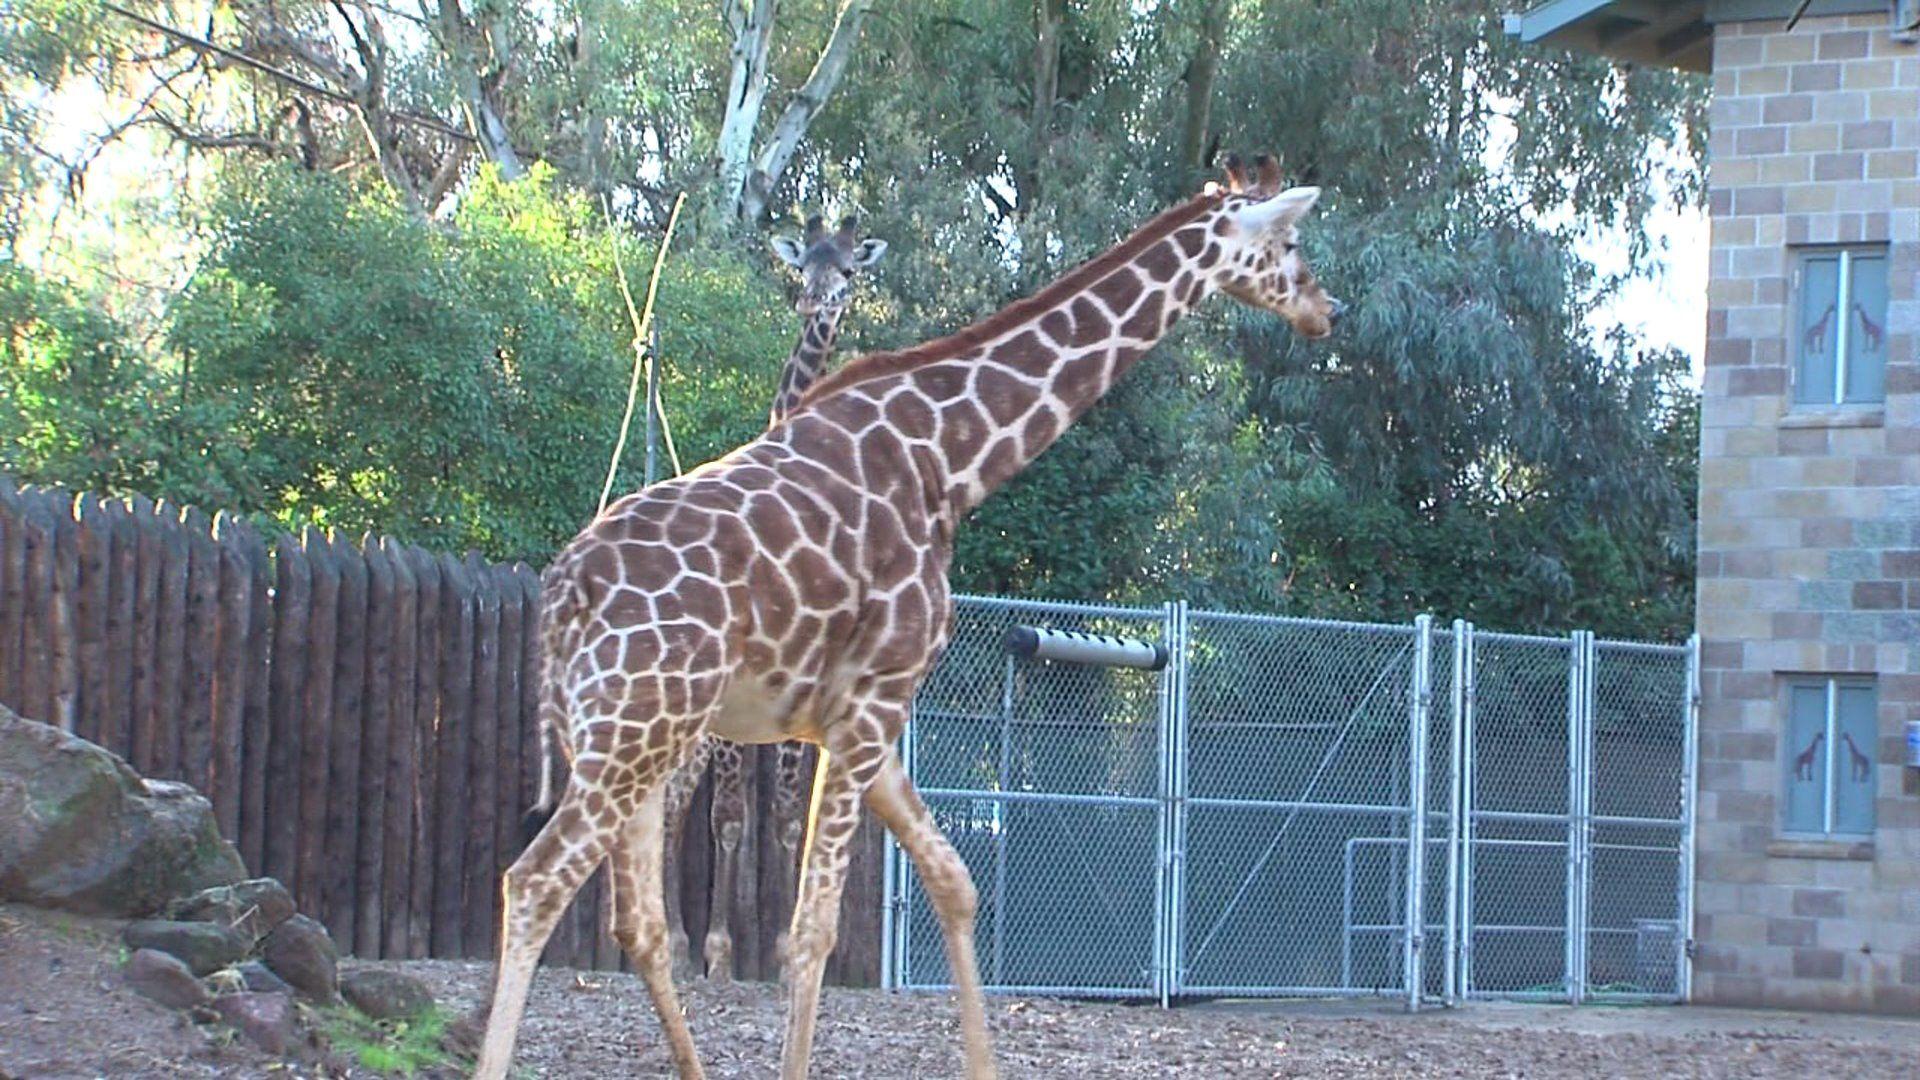 SacZooGiraffes